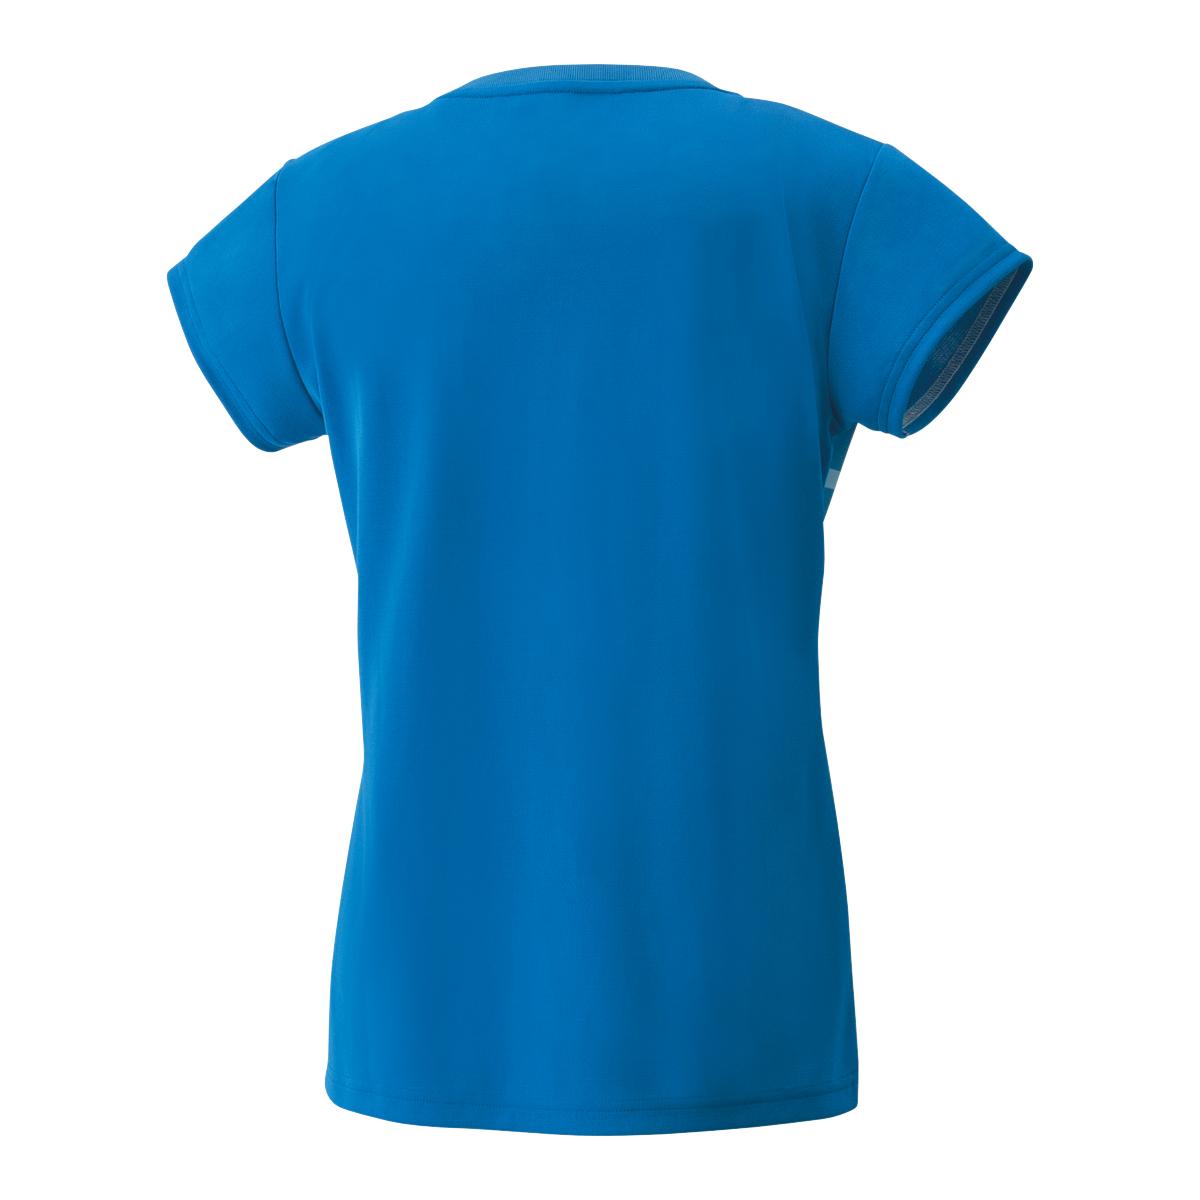 Women's Crew Neck ShirtDetailbild - 2